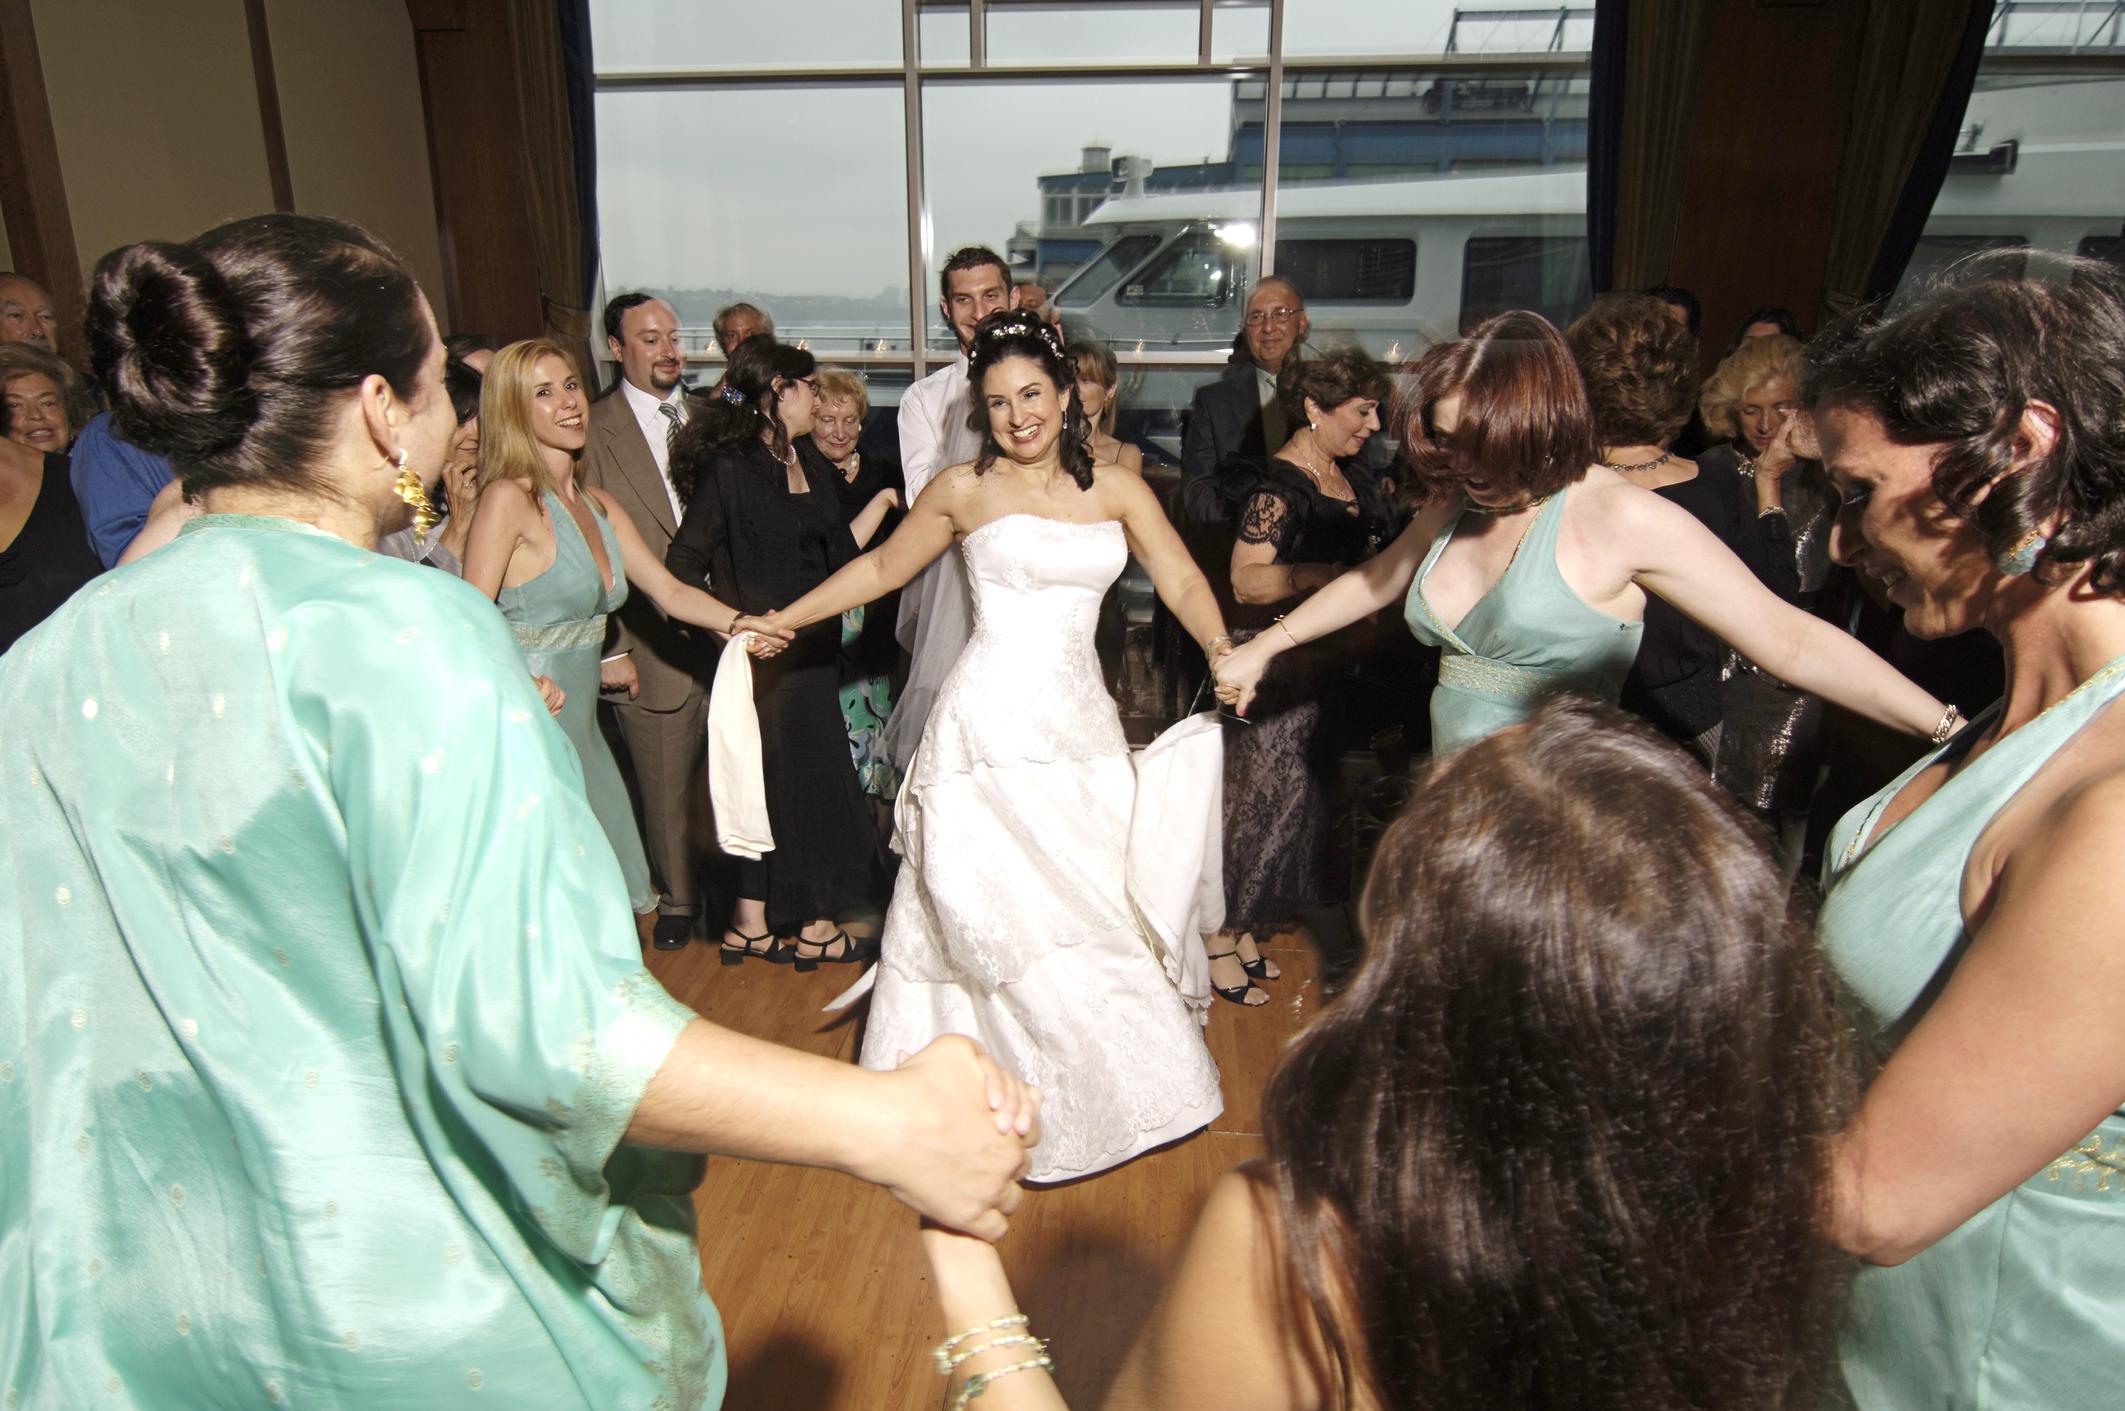 Ceilidh dancing at a wedding